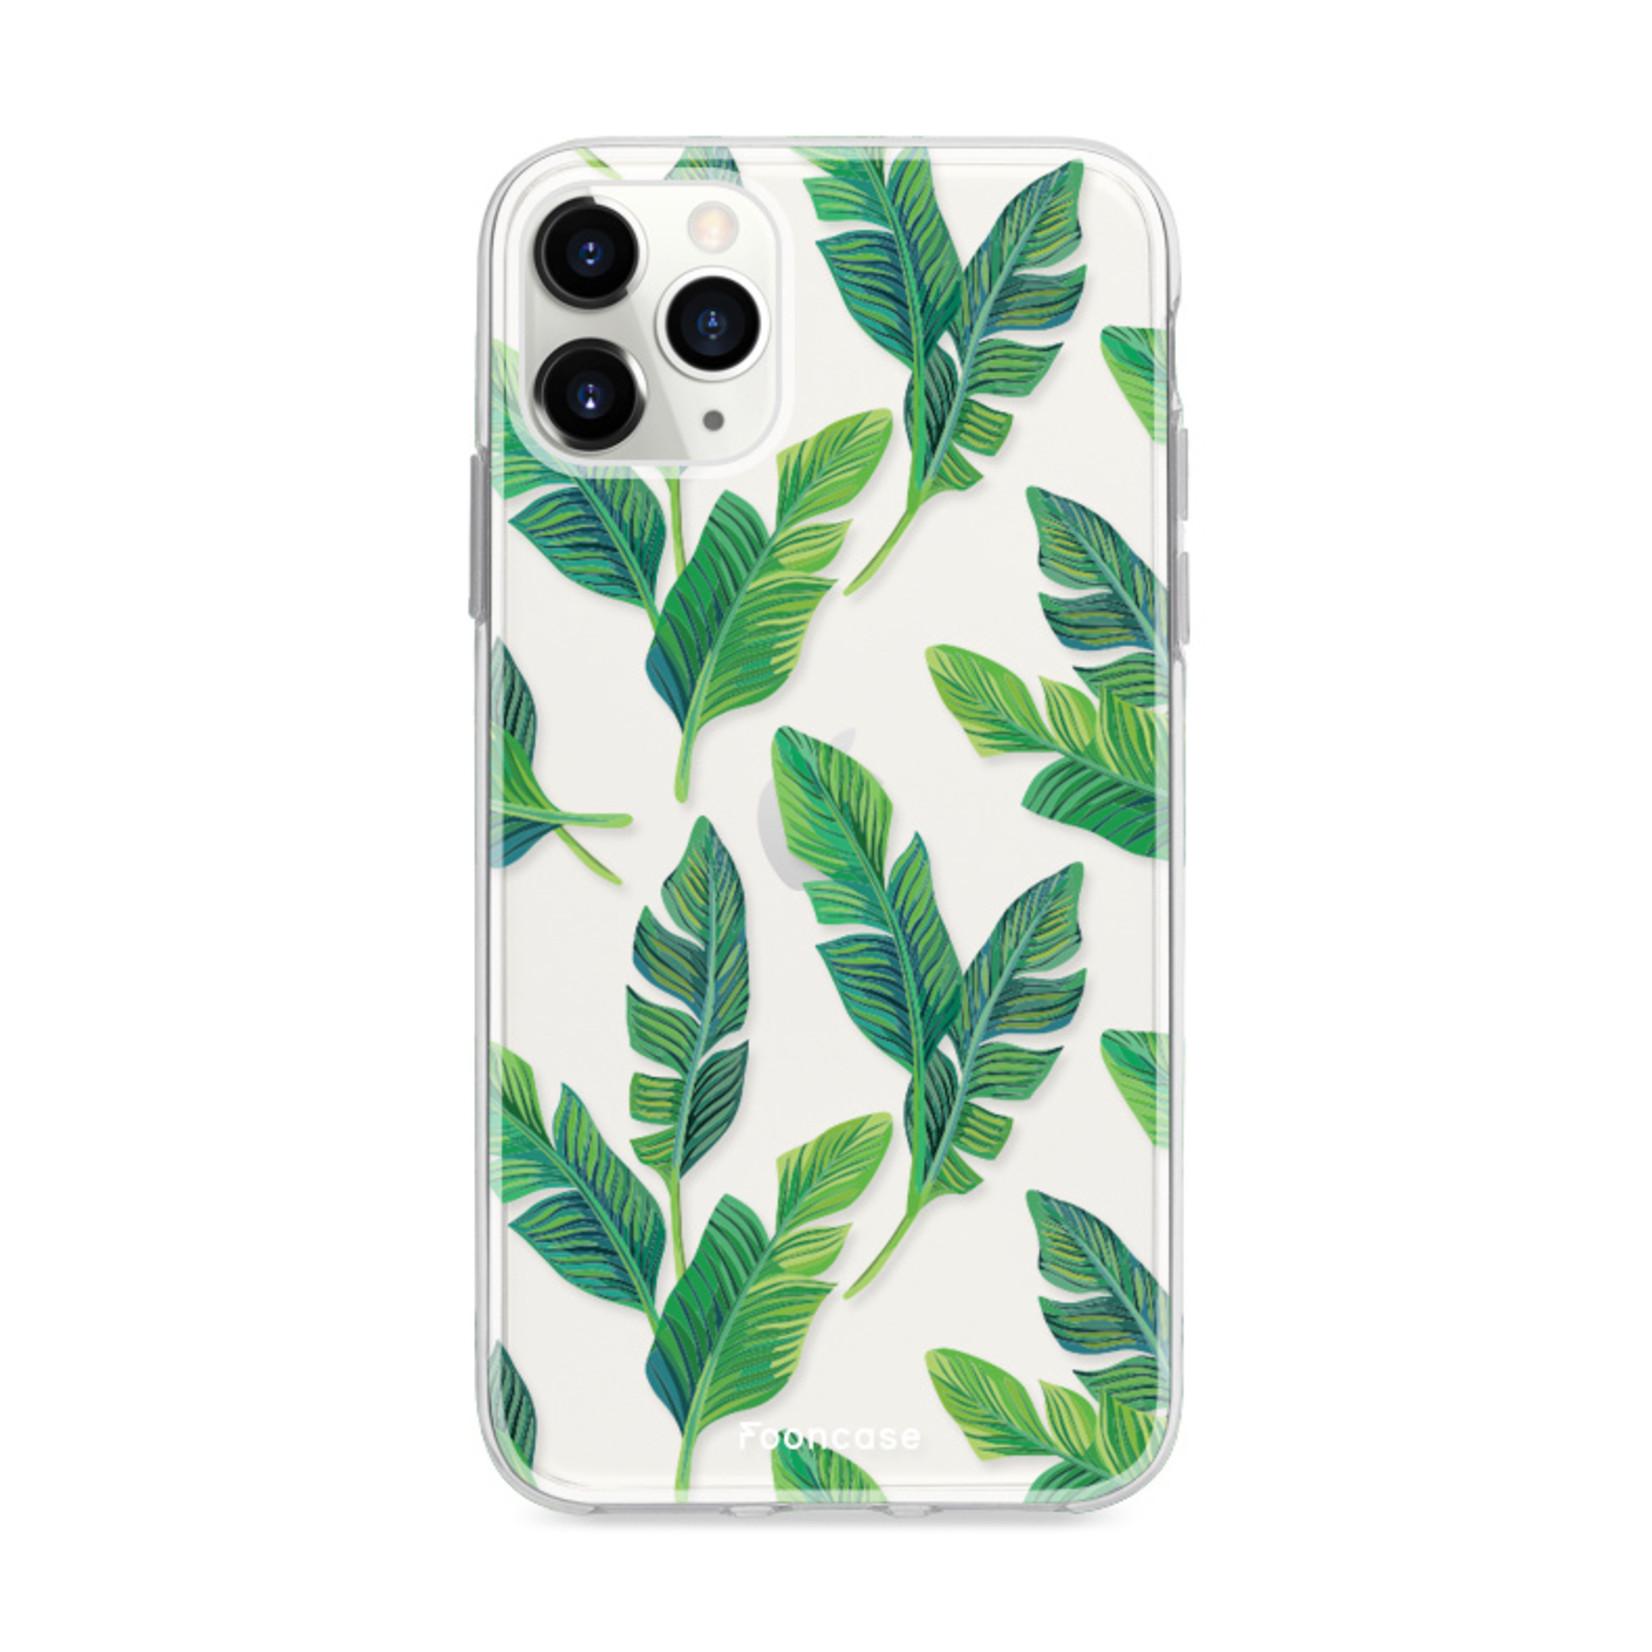 FOONCASE IPhone 12 Pro Max Case - Banana leaves